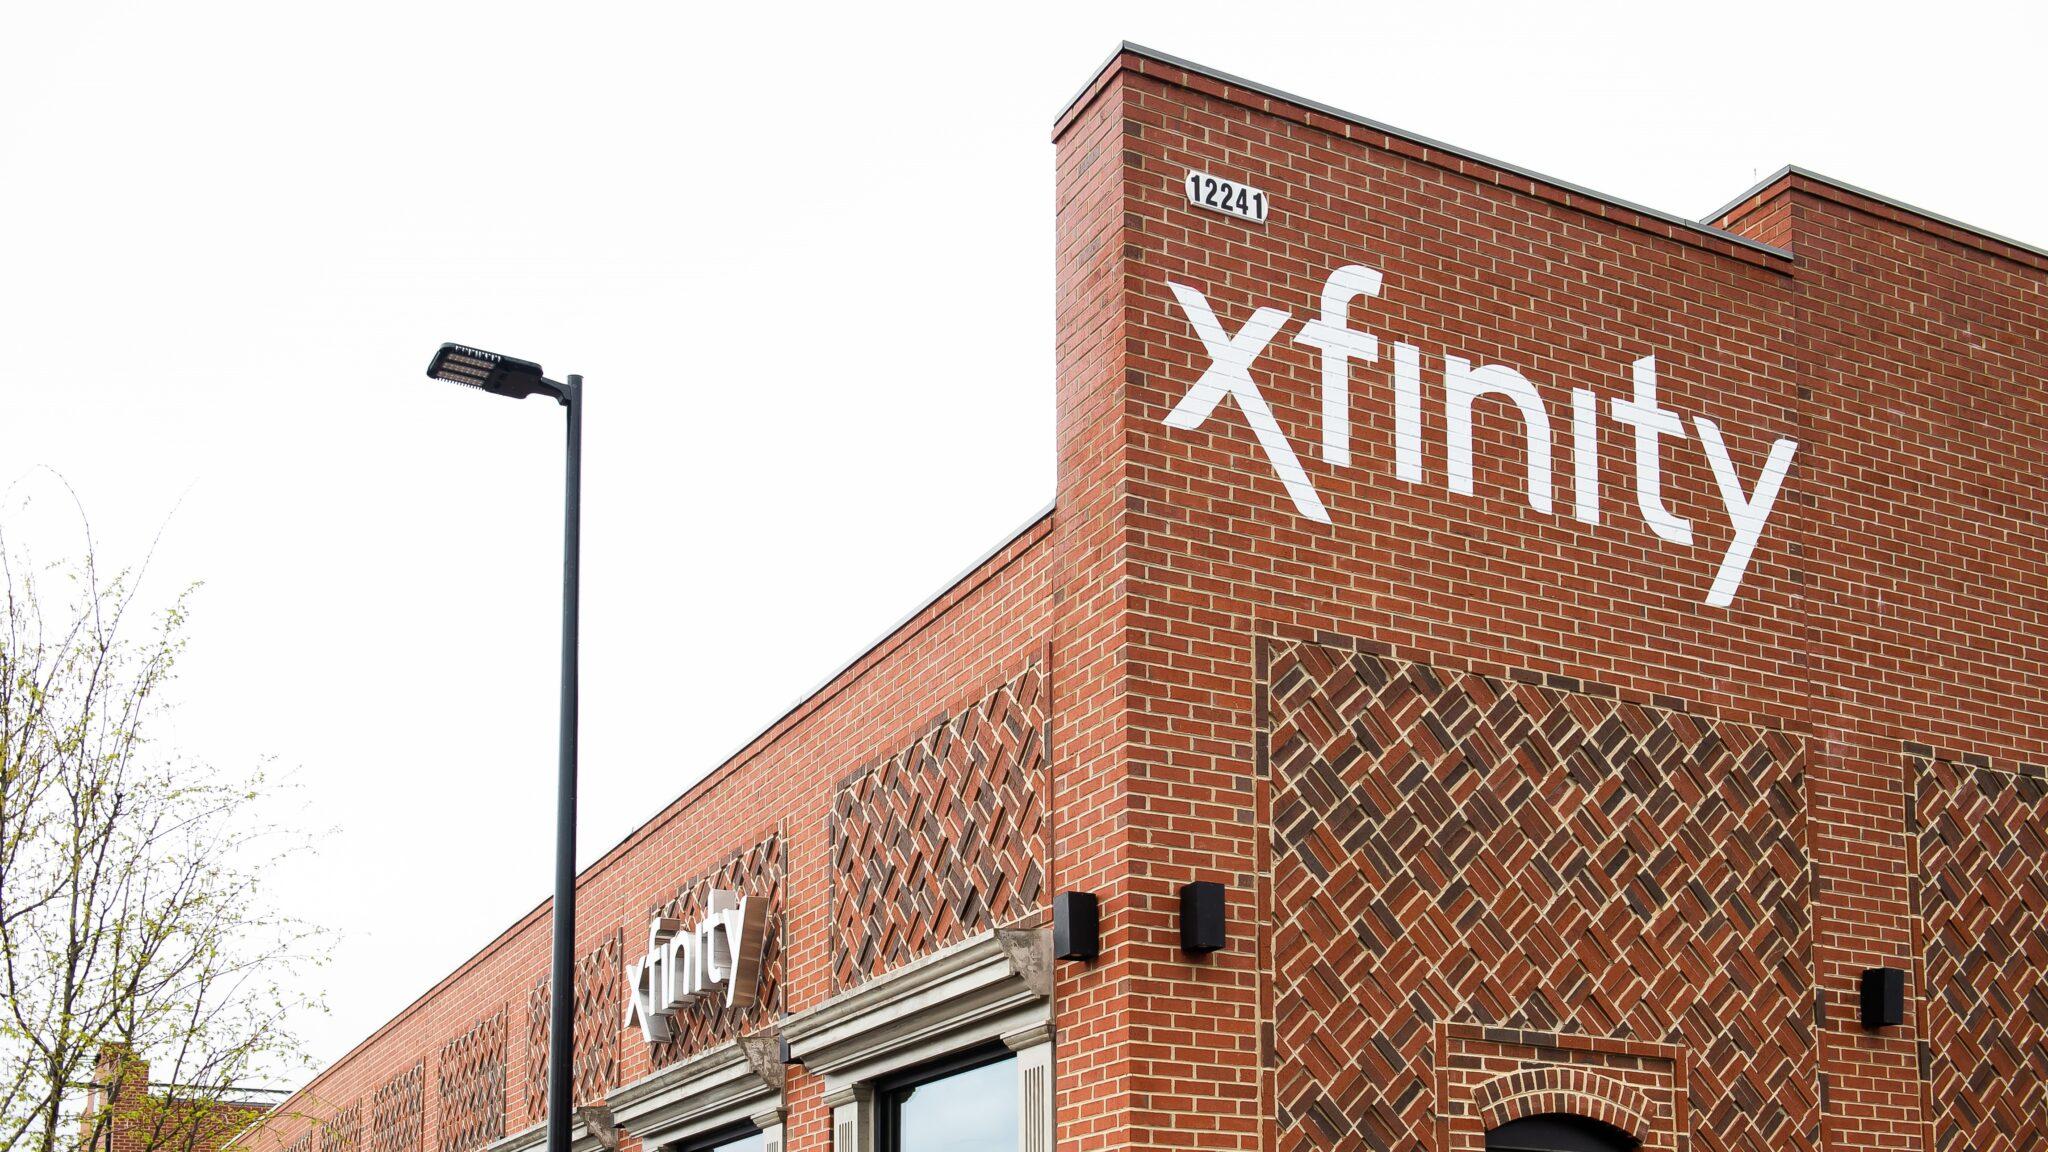 Comcast Xfinity Retail Store